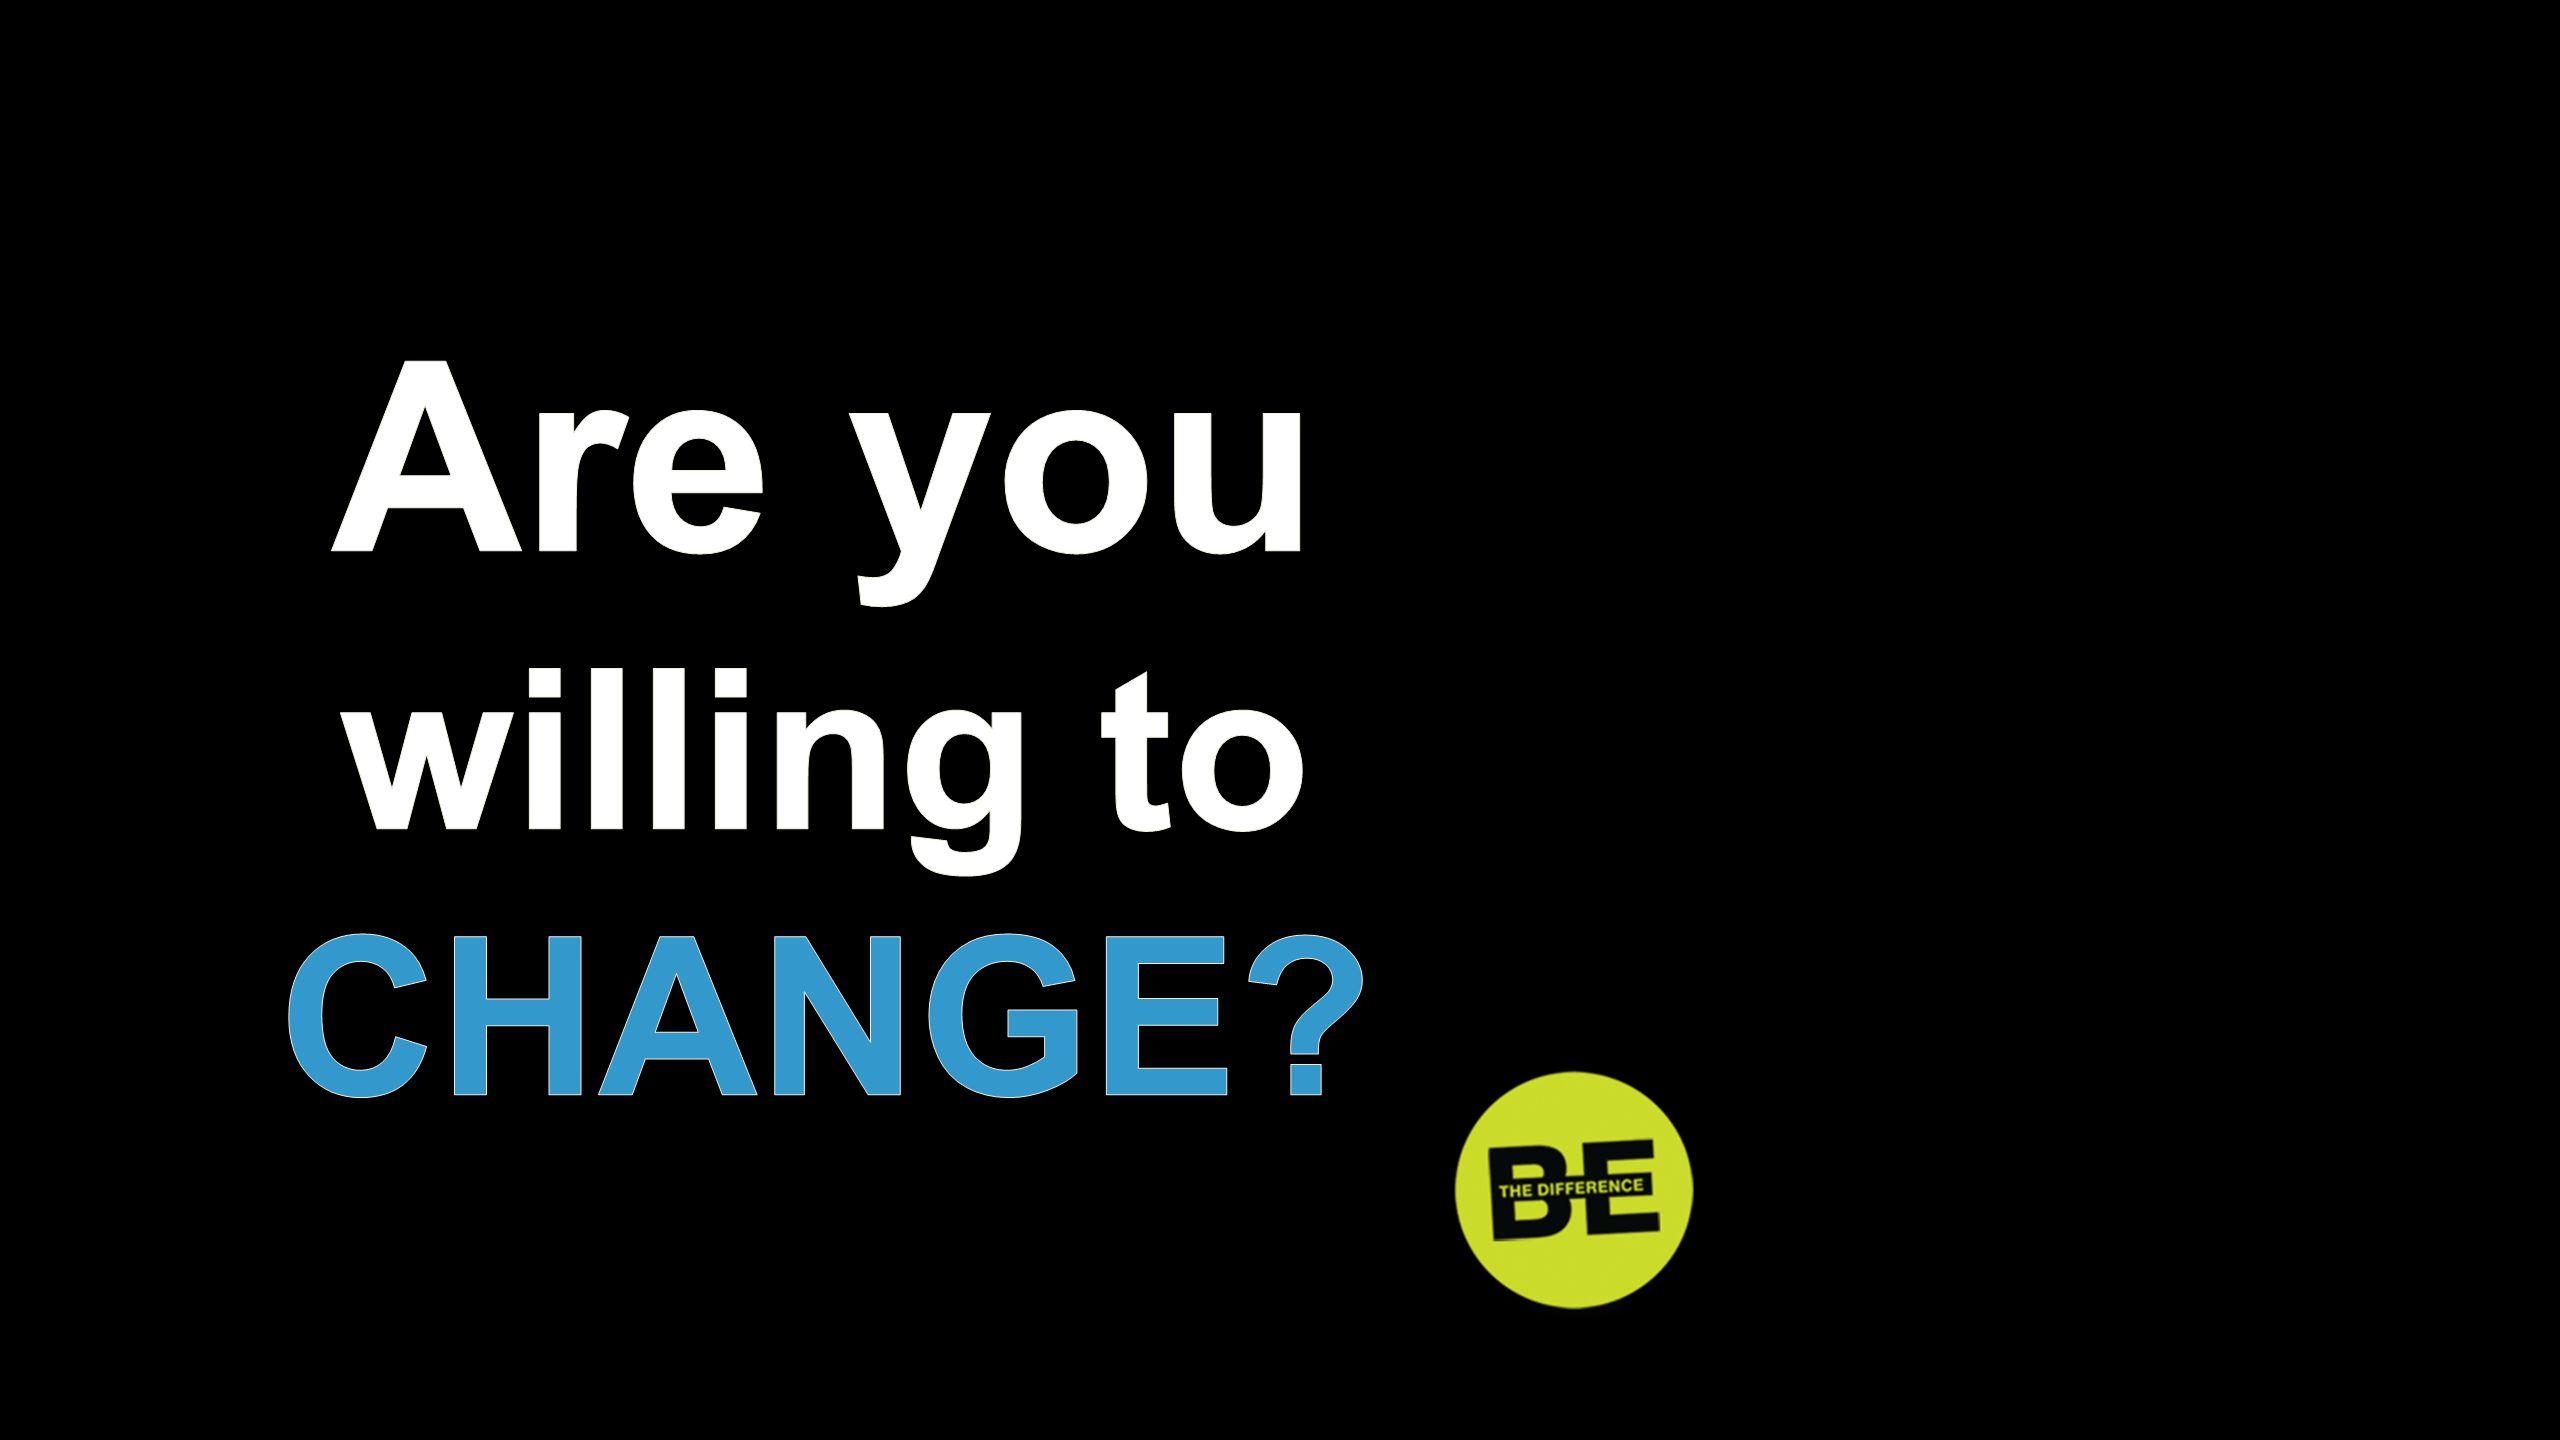 Are you willing to CHANGE Are you willing to change